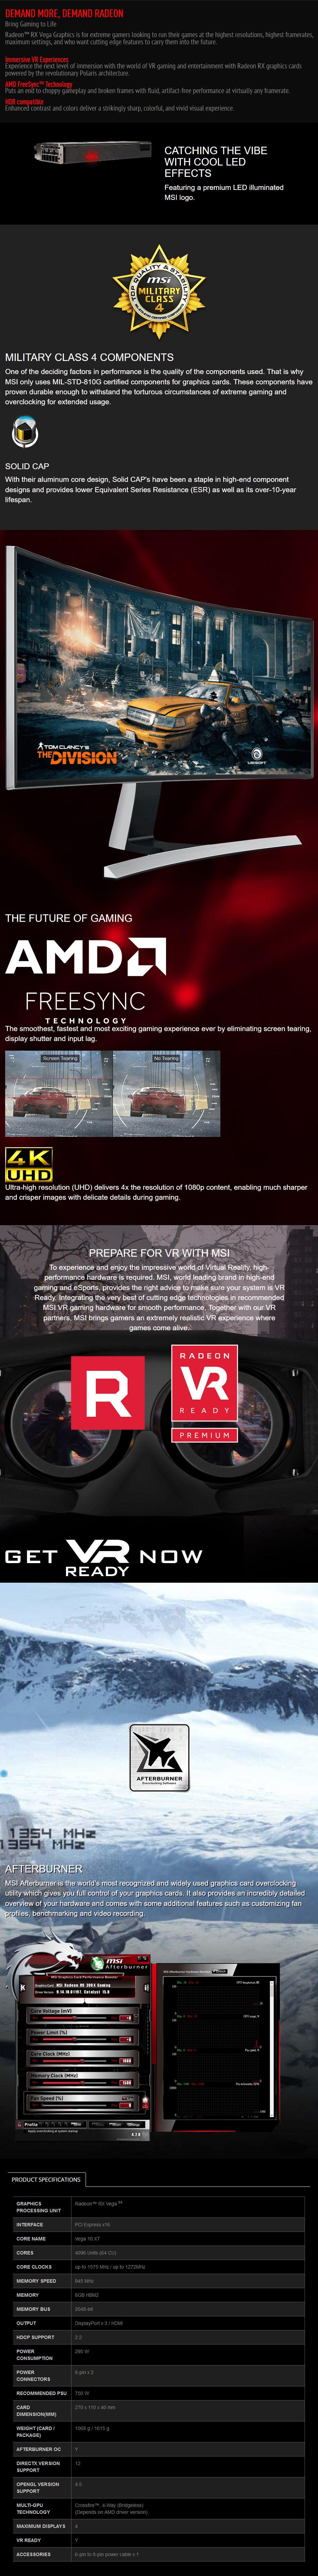 MSI Radeon RX Vega 64 Air Boost 8GB OC Video Card - Overview 1